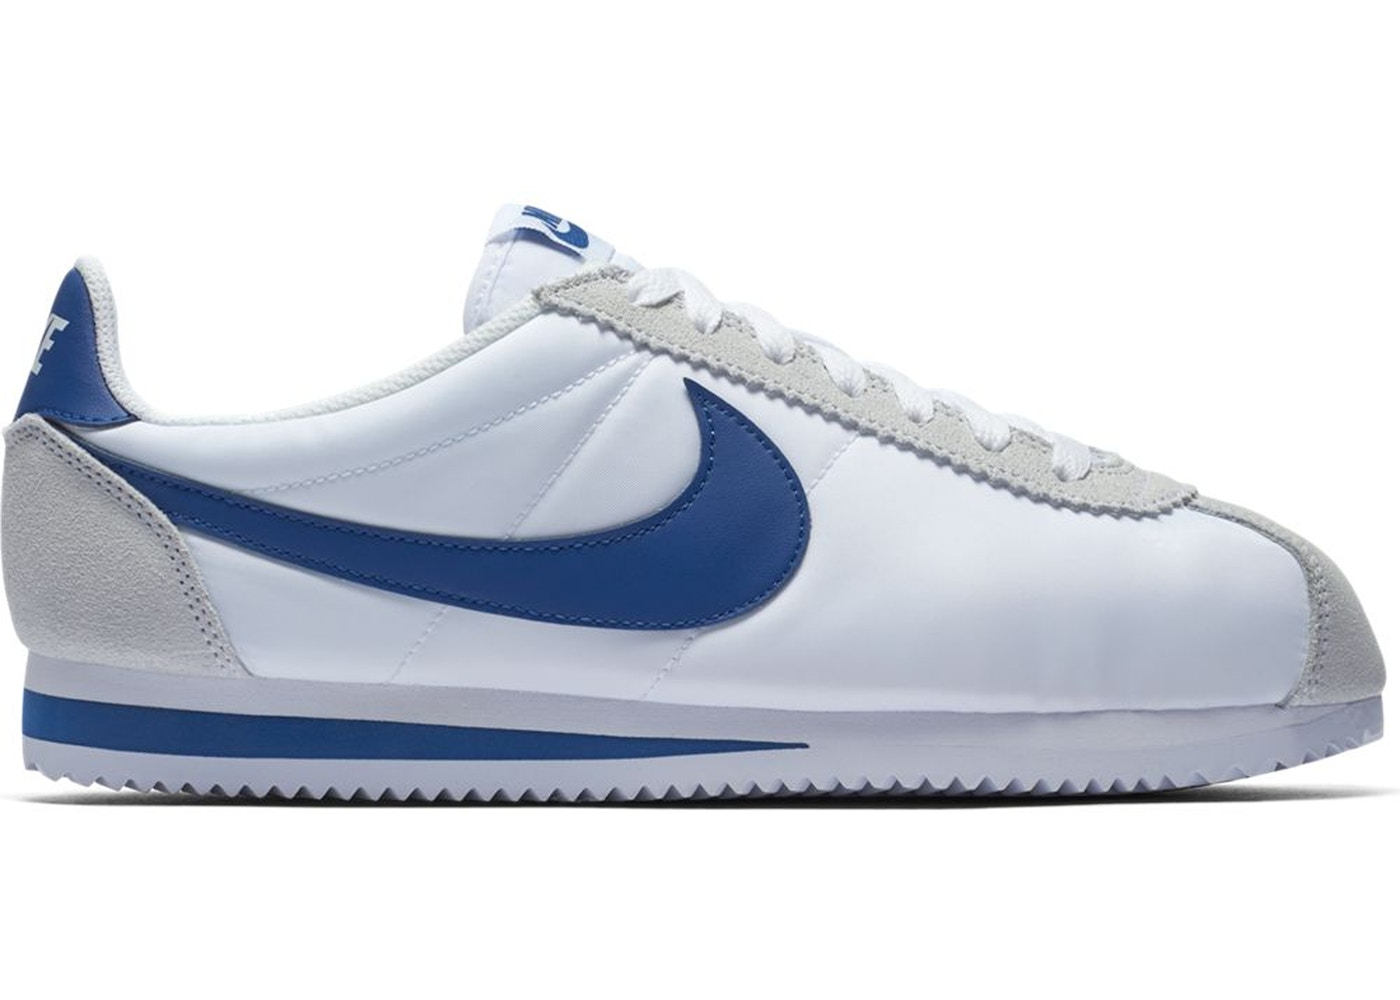 Nike Classic Cortez Nylon White Gym Blue